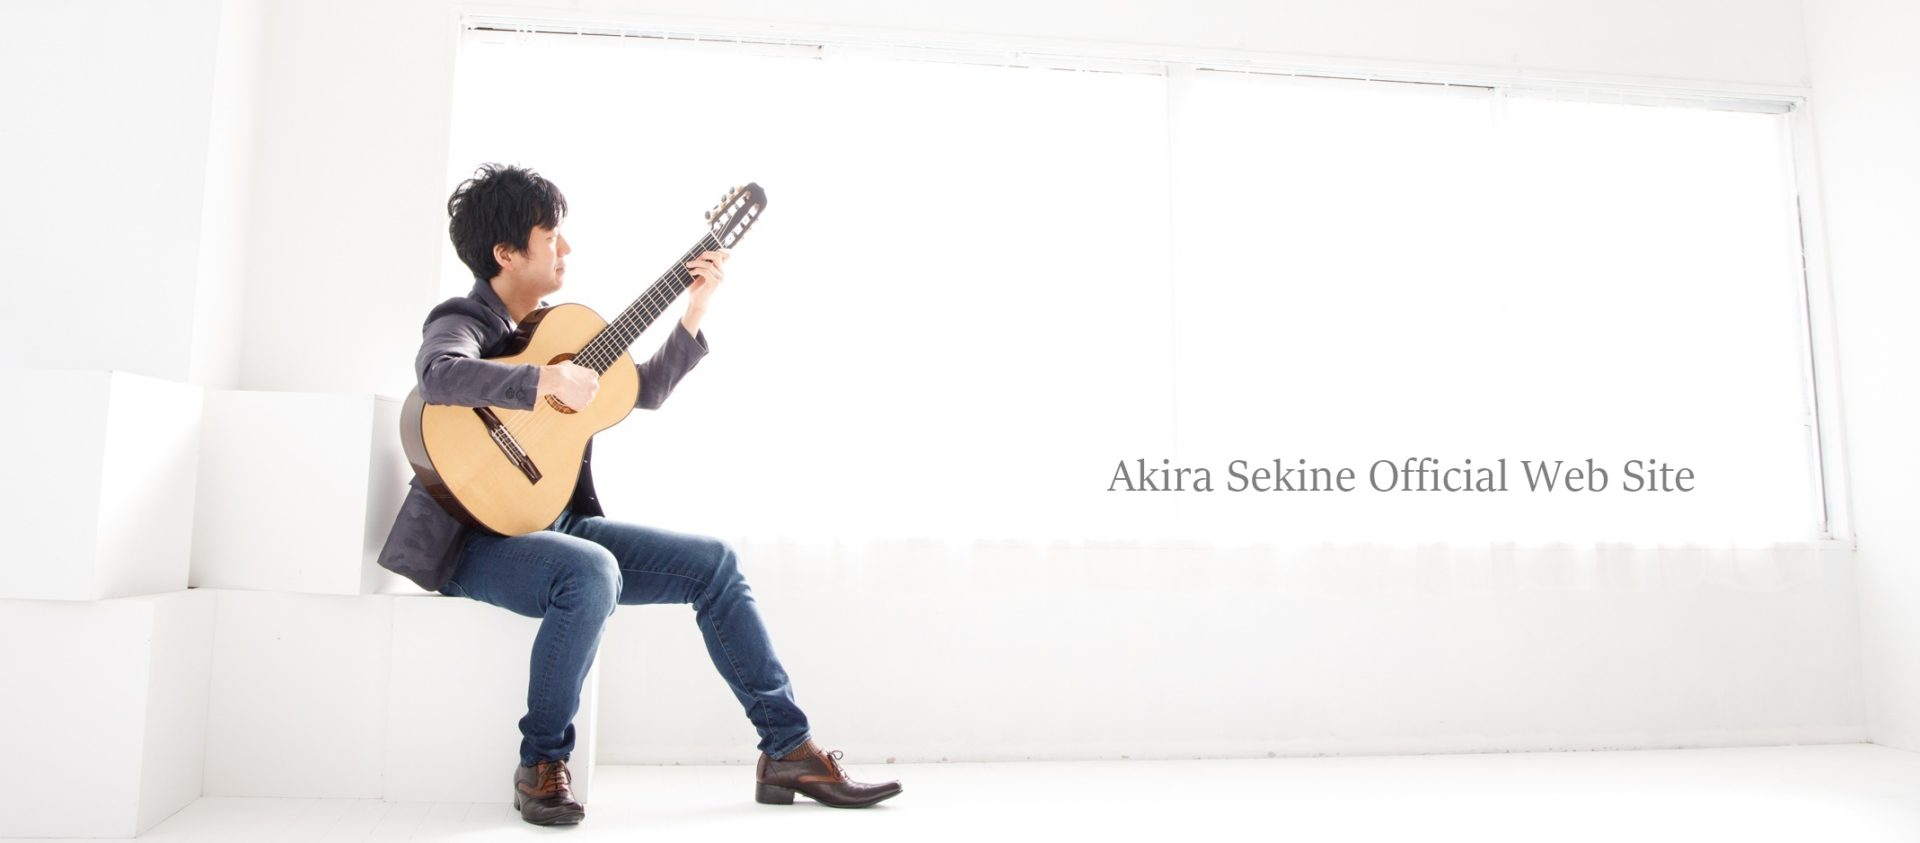 Akira Sekine Official Web Site